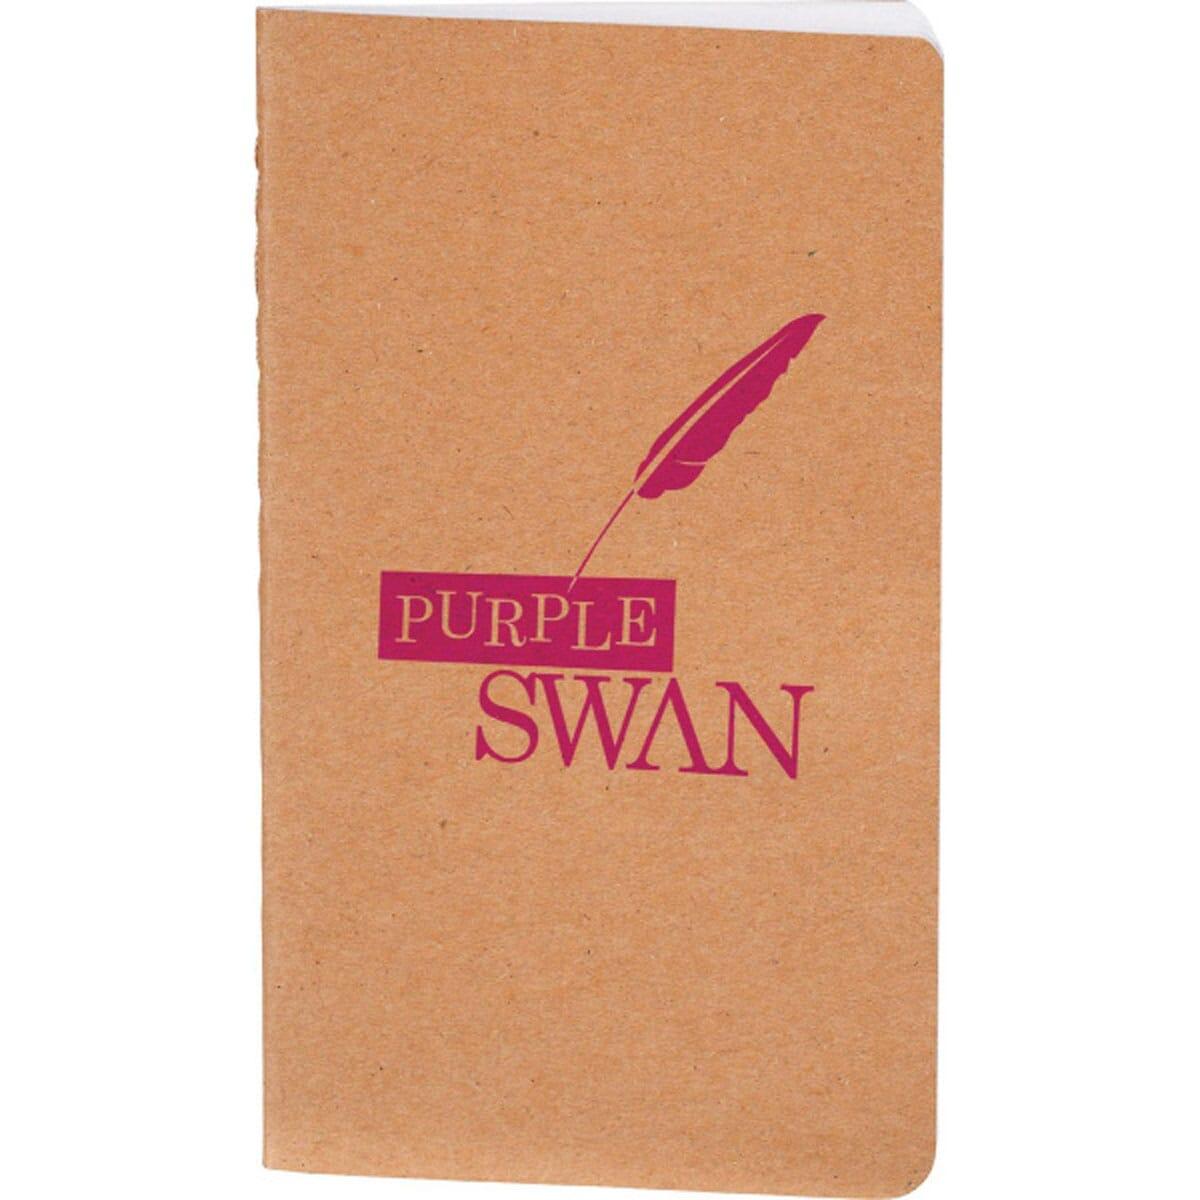 Environmentally friendly notebook